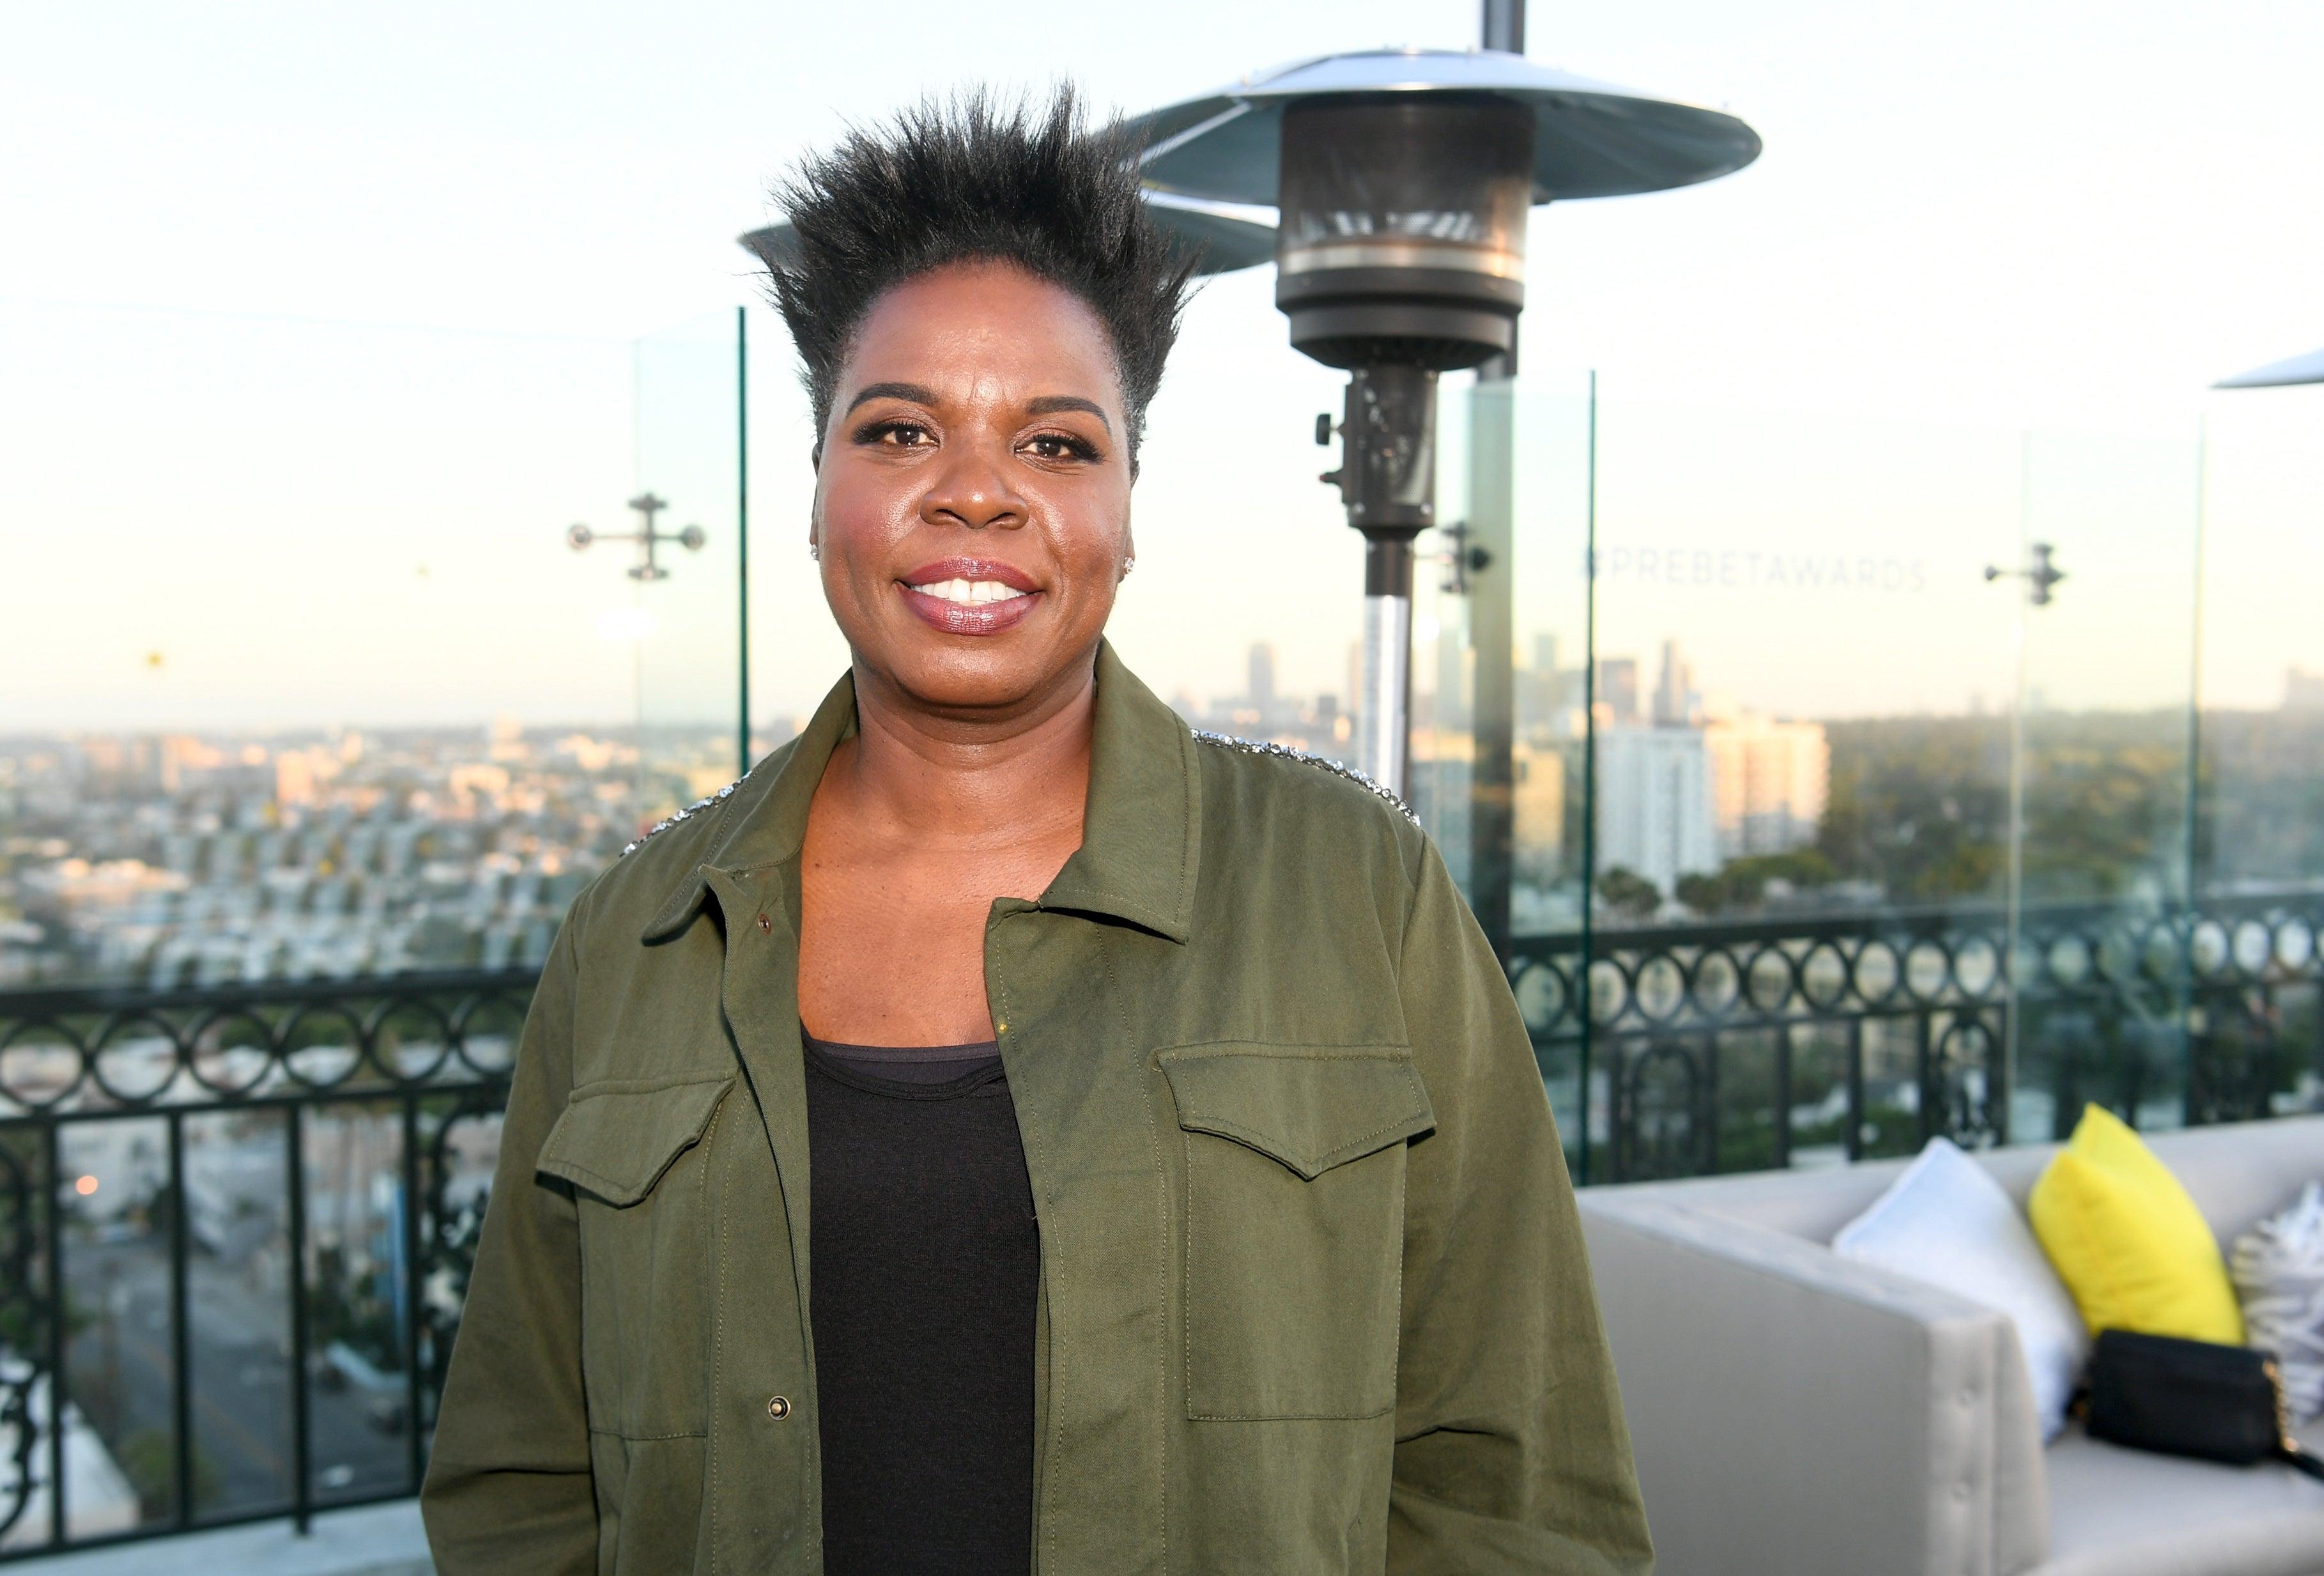 Leslie Jones Slams The Ritz-Carlton, Claims 'They Don't Like Black People'